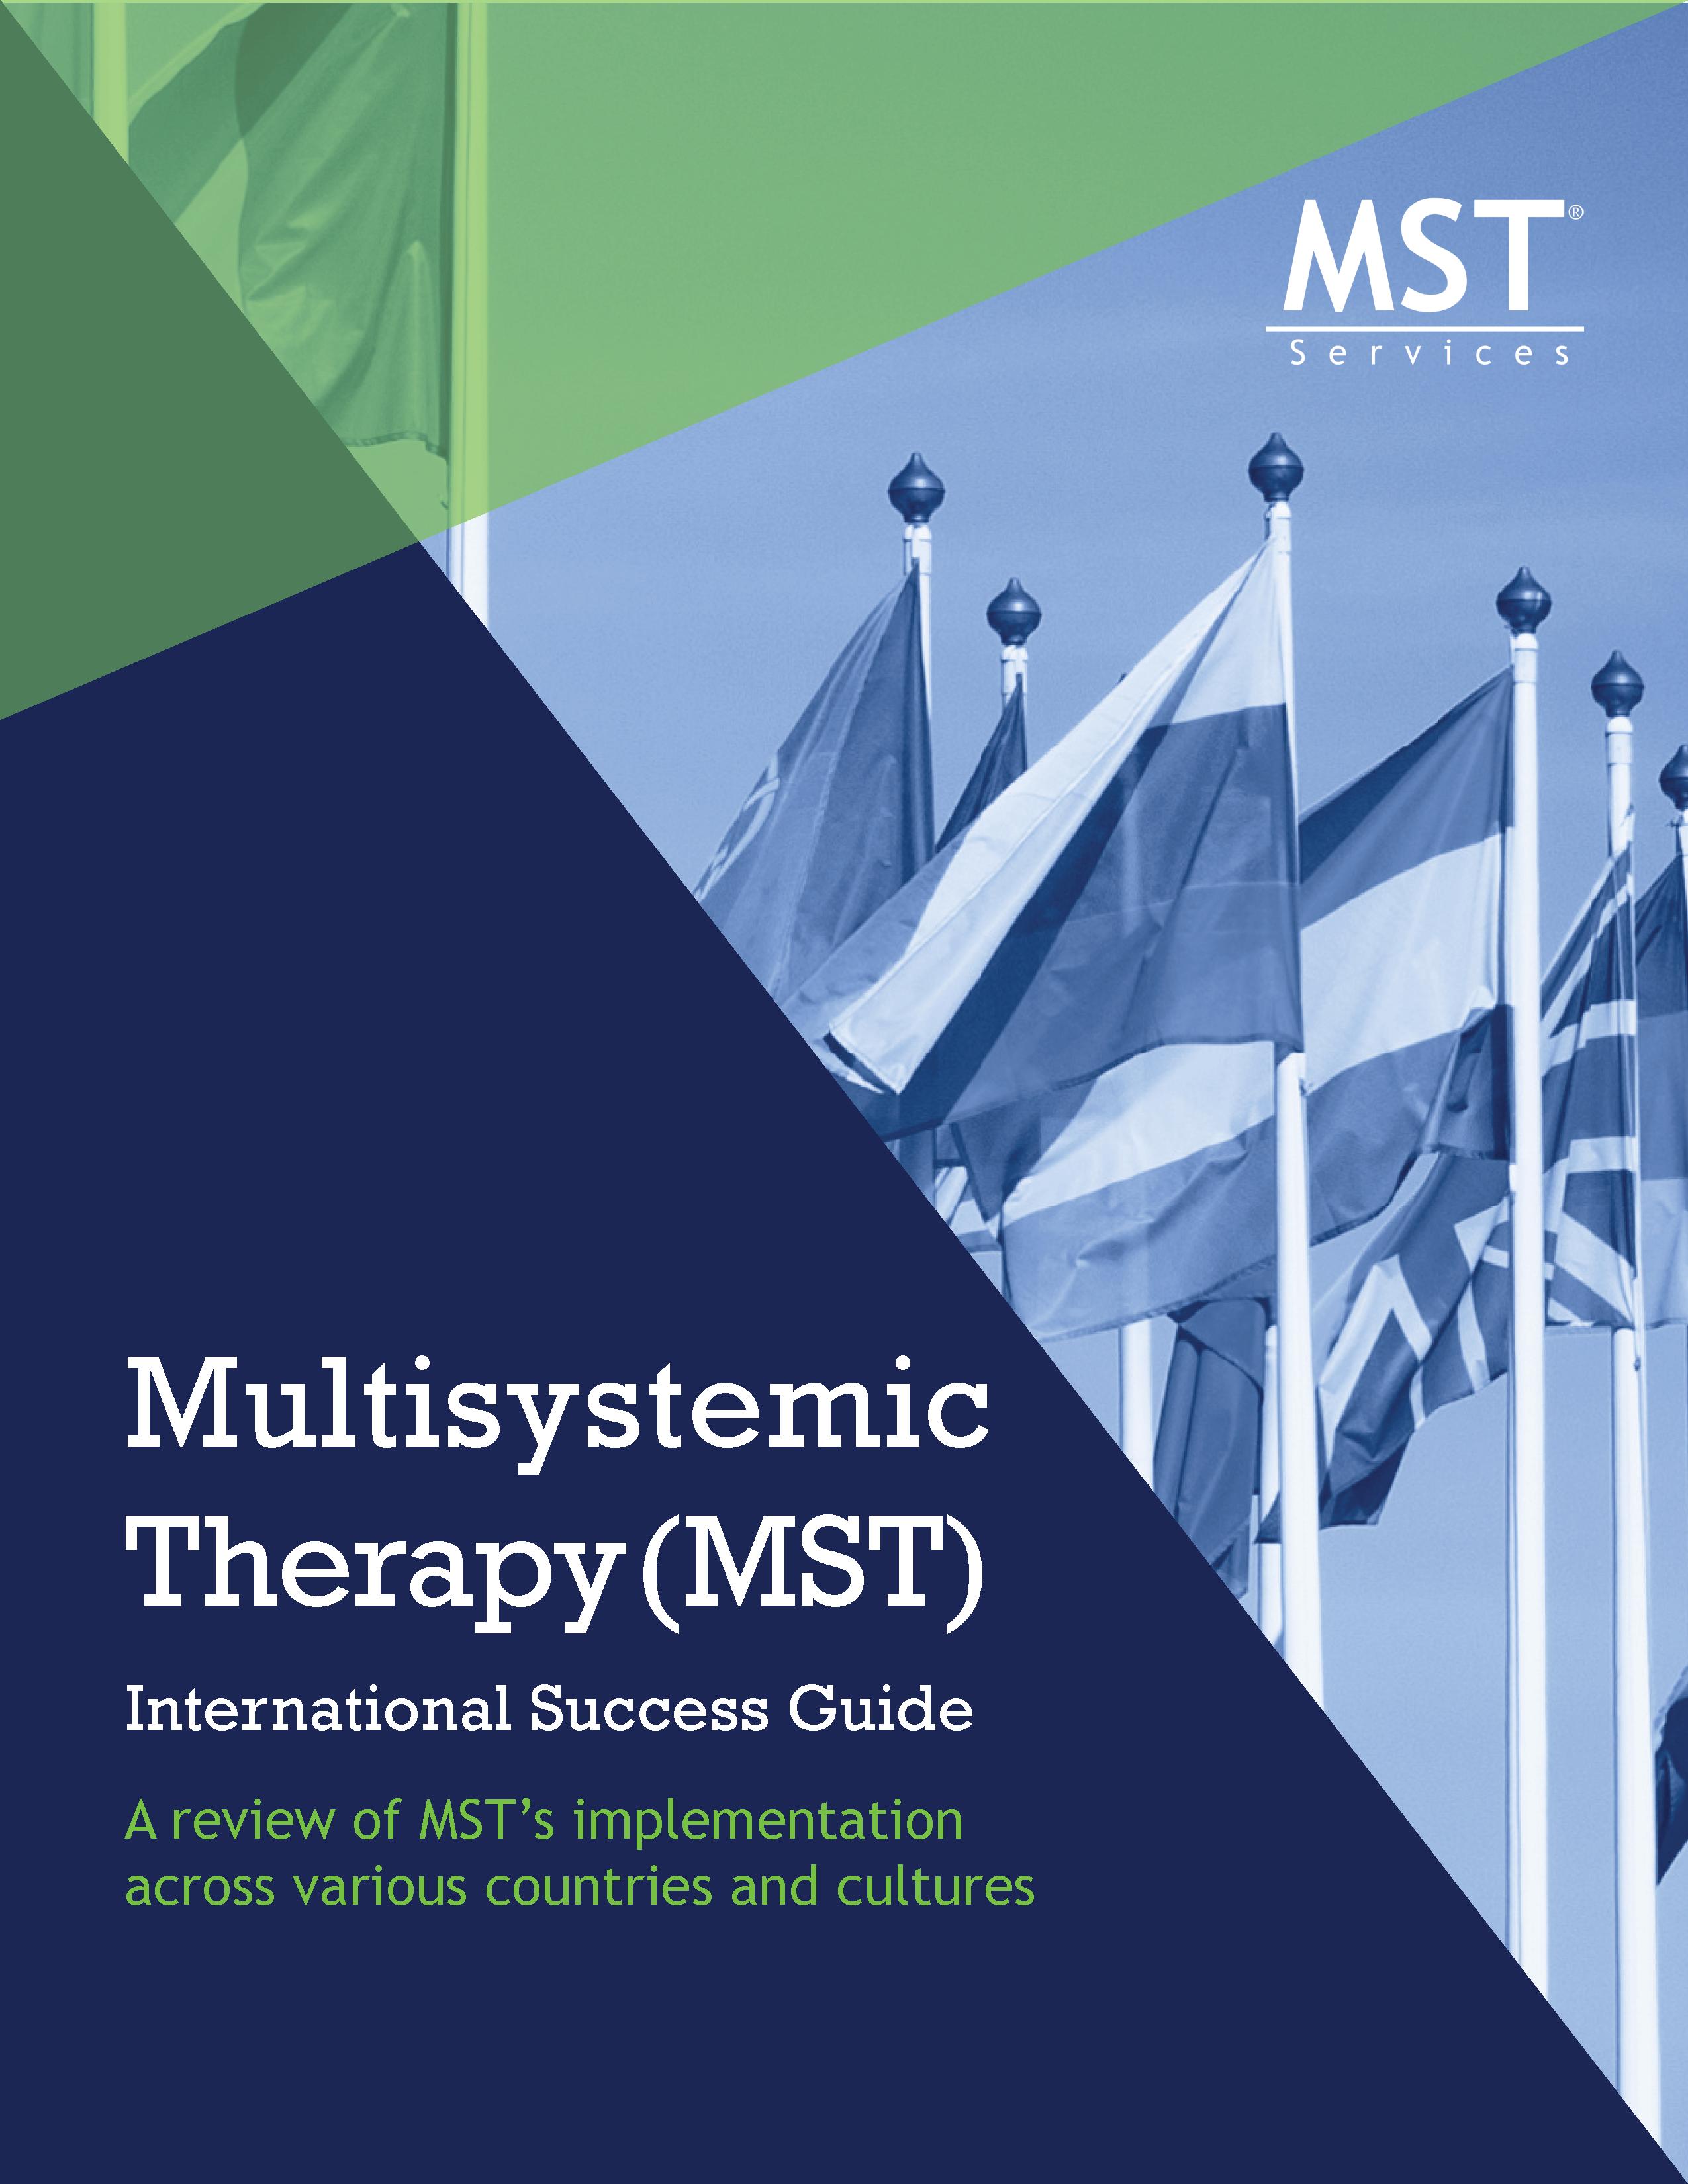 International Success Guide 2021